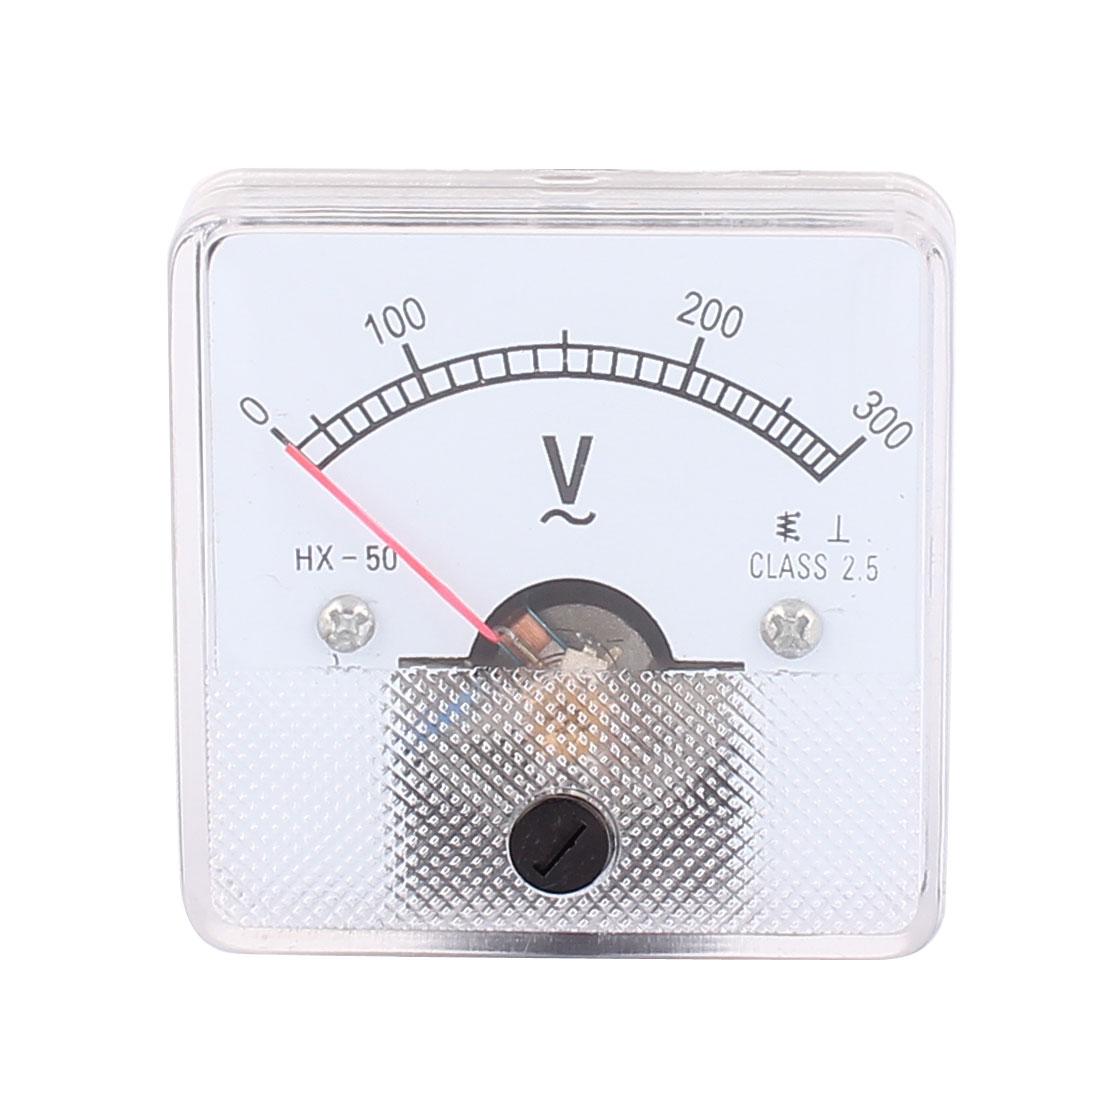 AC 0-300V Fine Tuning Dial Panel Analog Voltage Meter Voltmeter HX-50